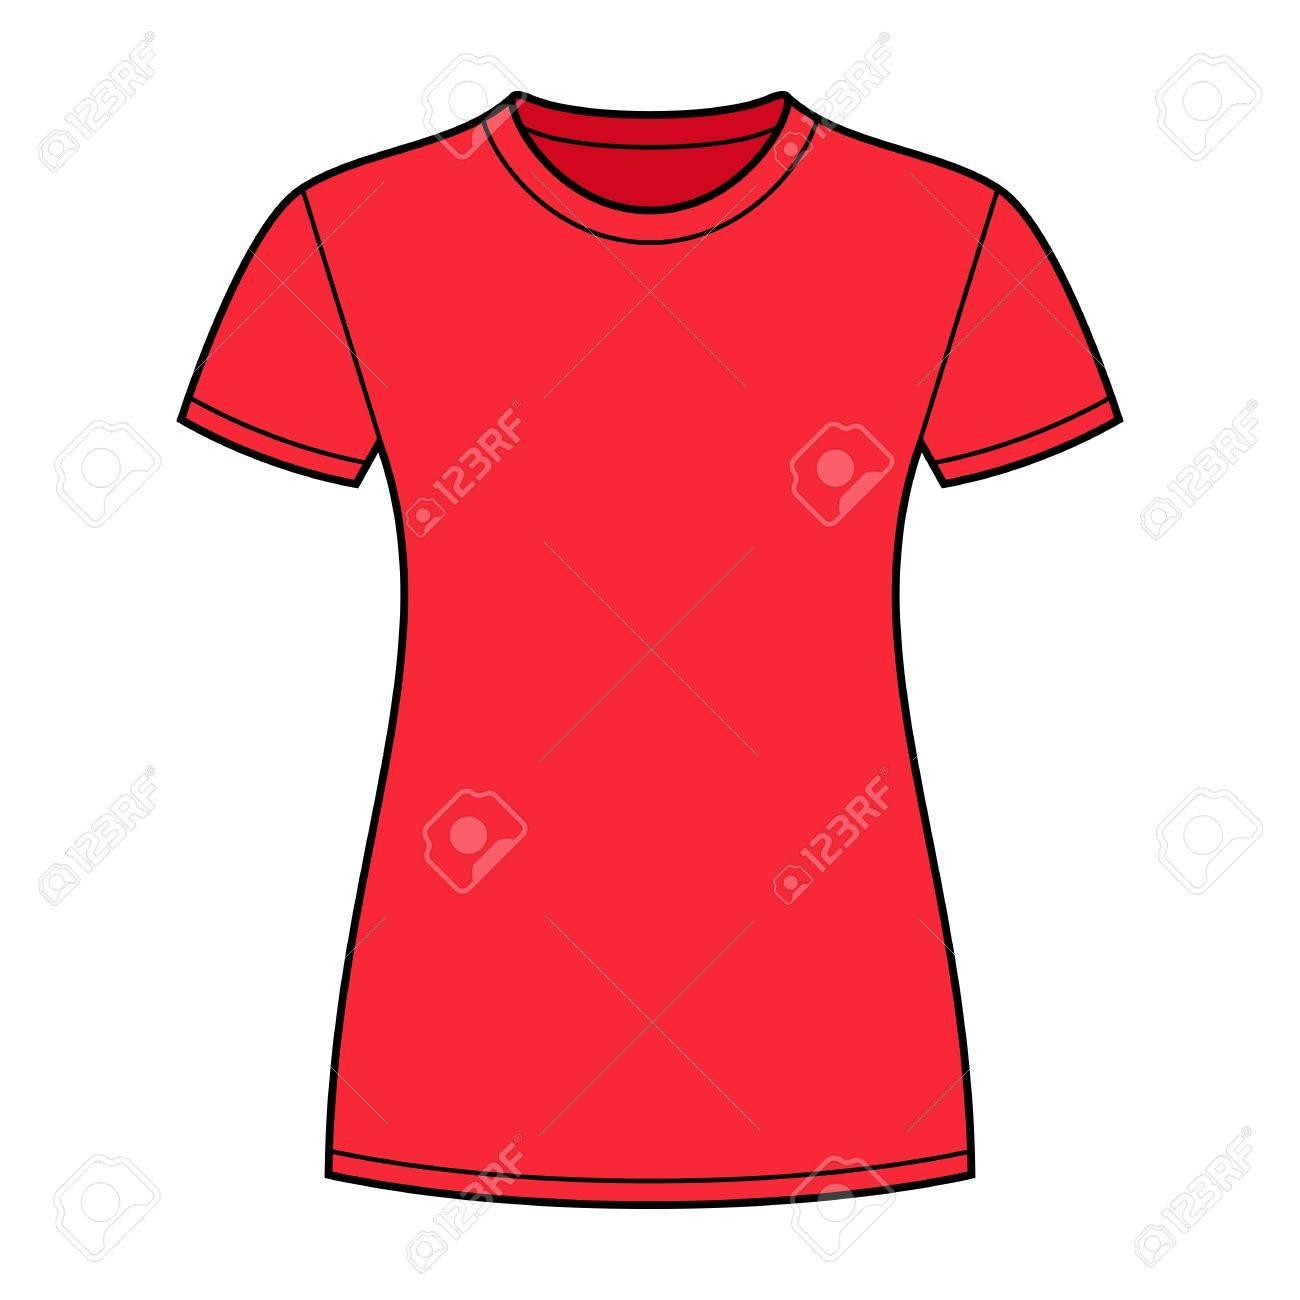 T shirt design red - Red T Shirt Design Template Stock Vector 14087049